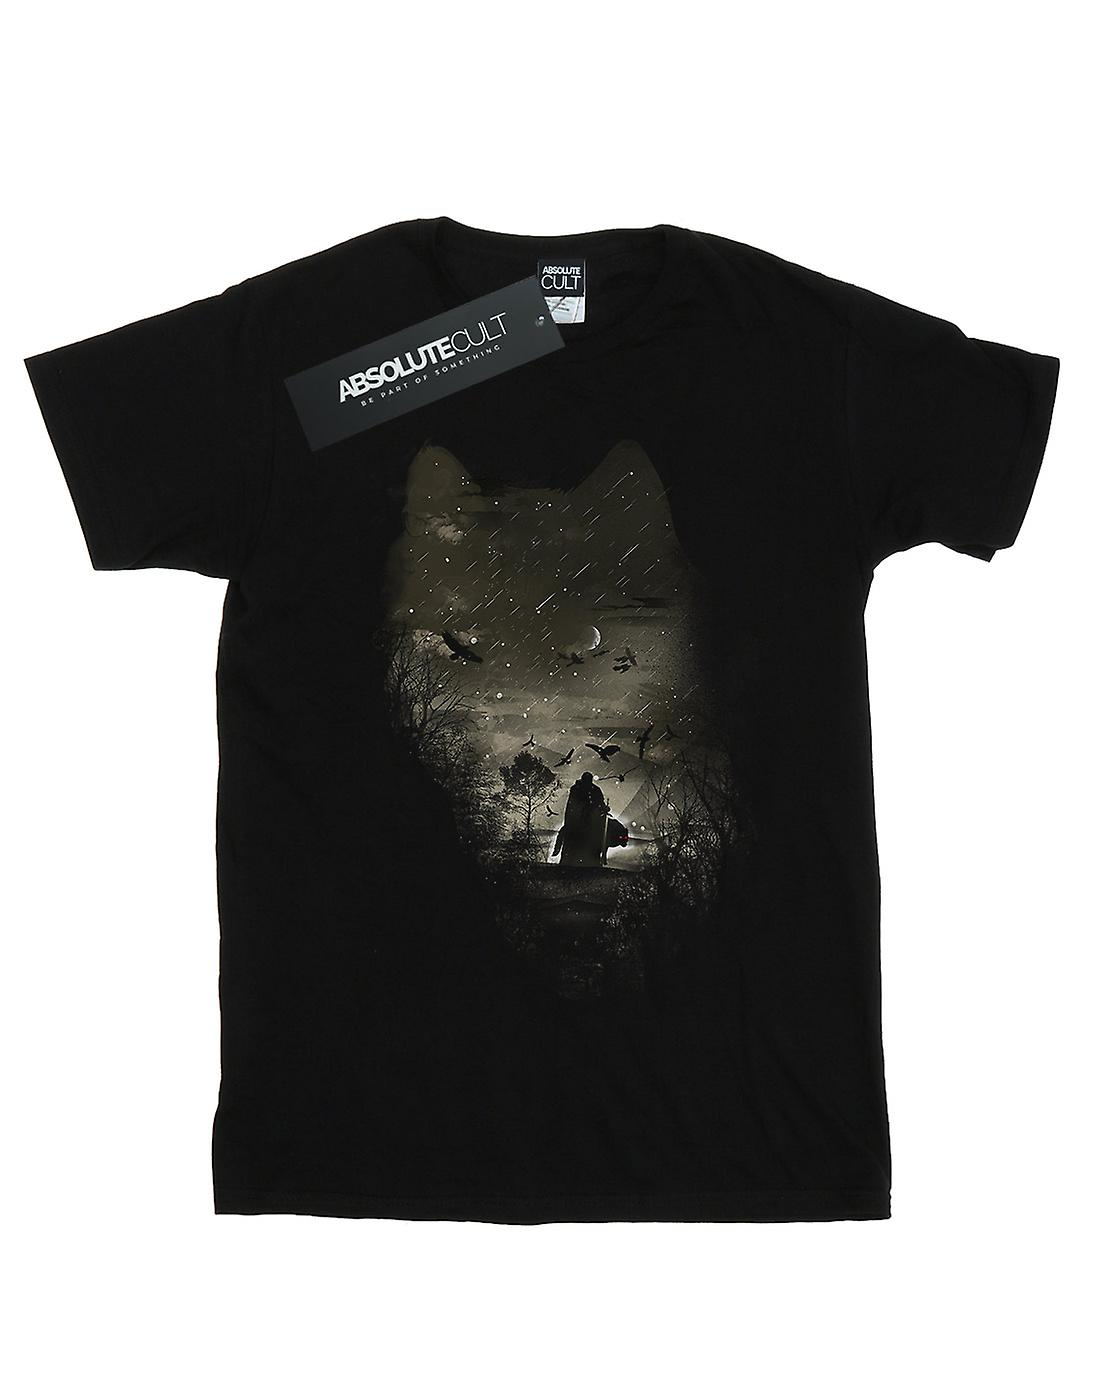 Dan Dingeroz Girls Lord Crow T-Shirt